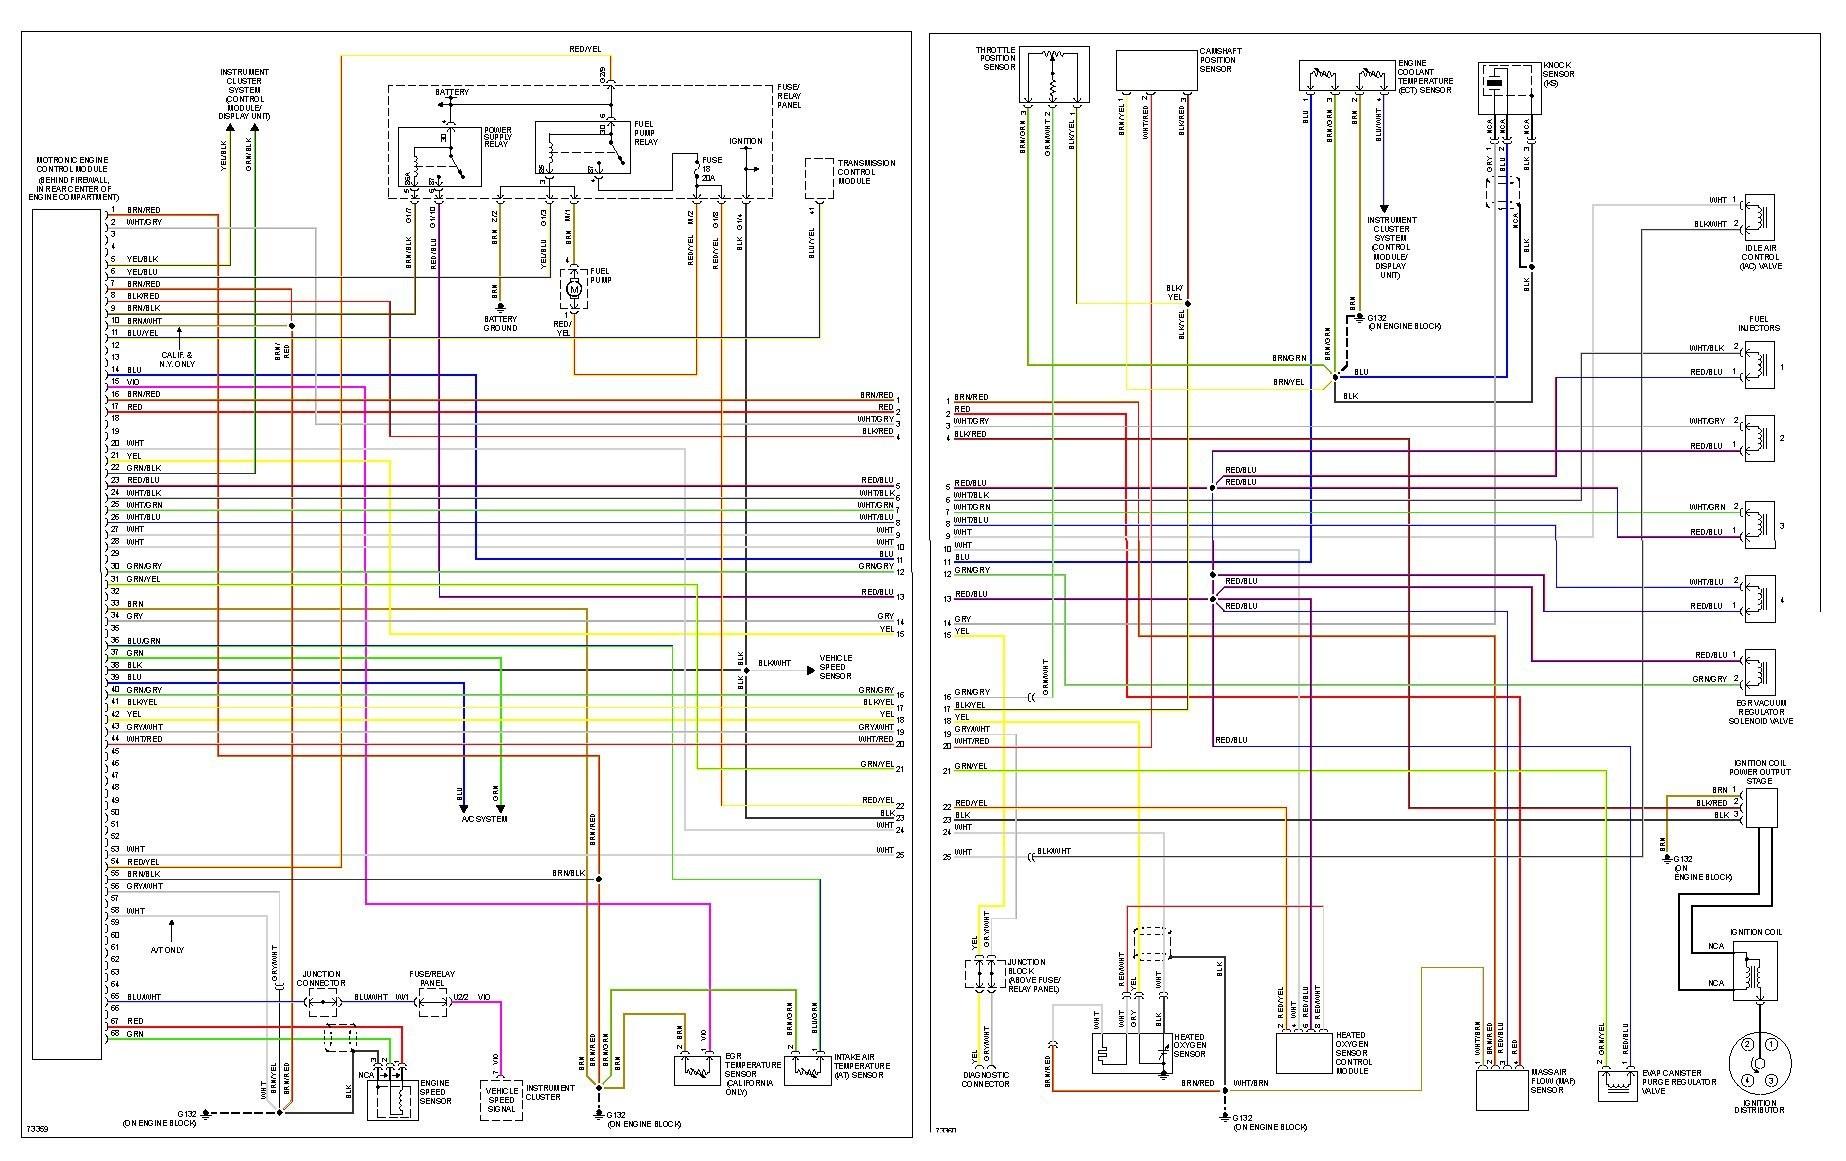 2003 Vw Jetta Engine Diagram Vw Golf Wiring Diagram Wiring Diagram Of 2003  Vw Jetta Engine